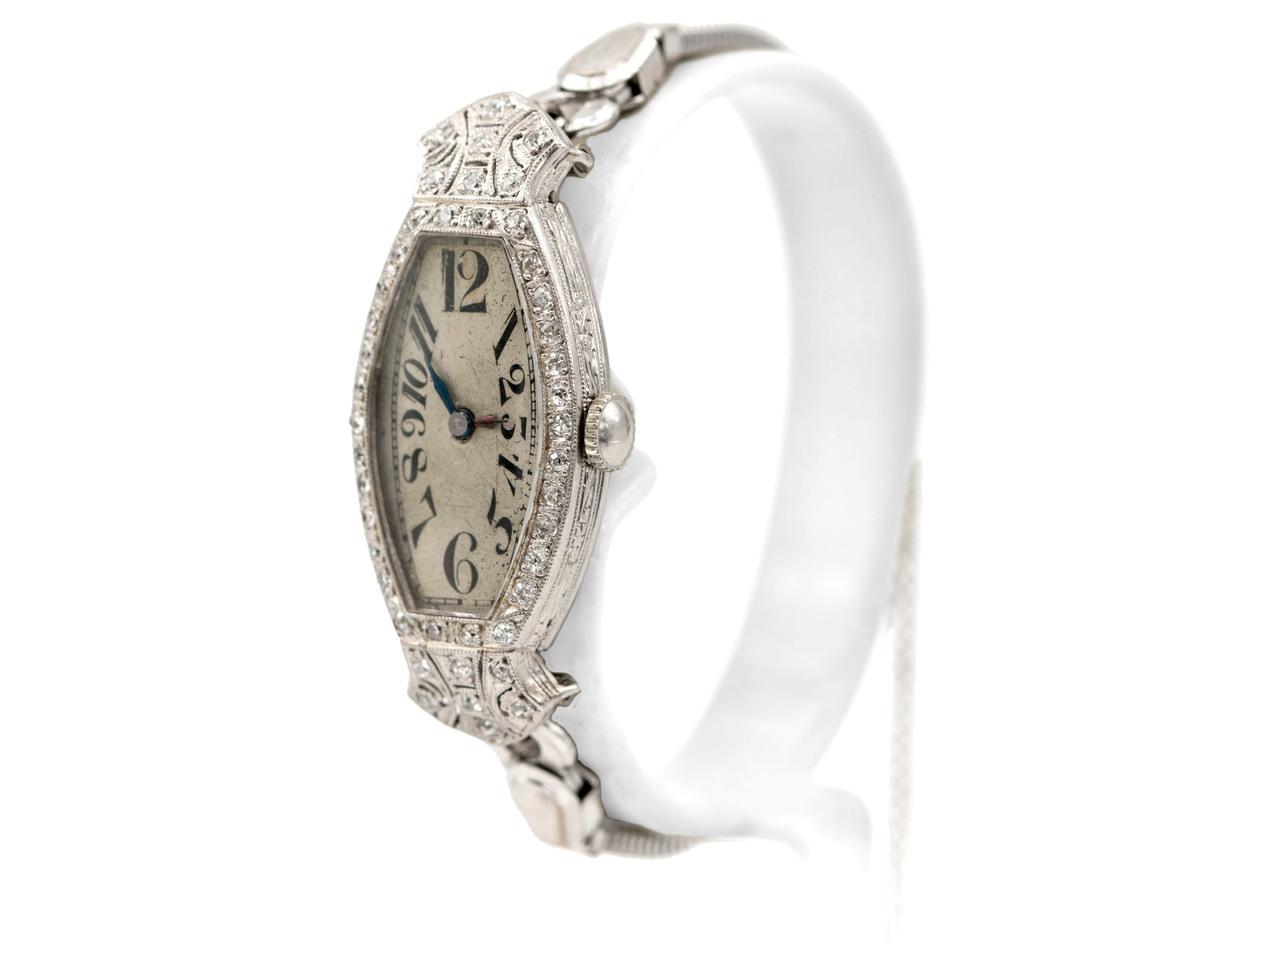 Art Deco Platinum & Diamond Watch by Bulova